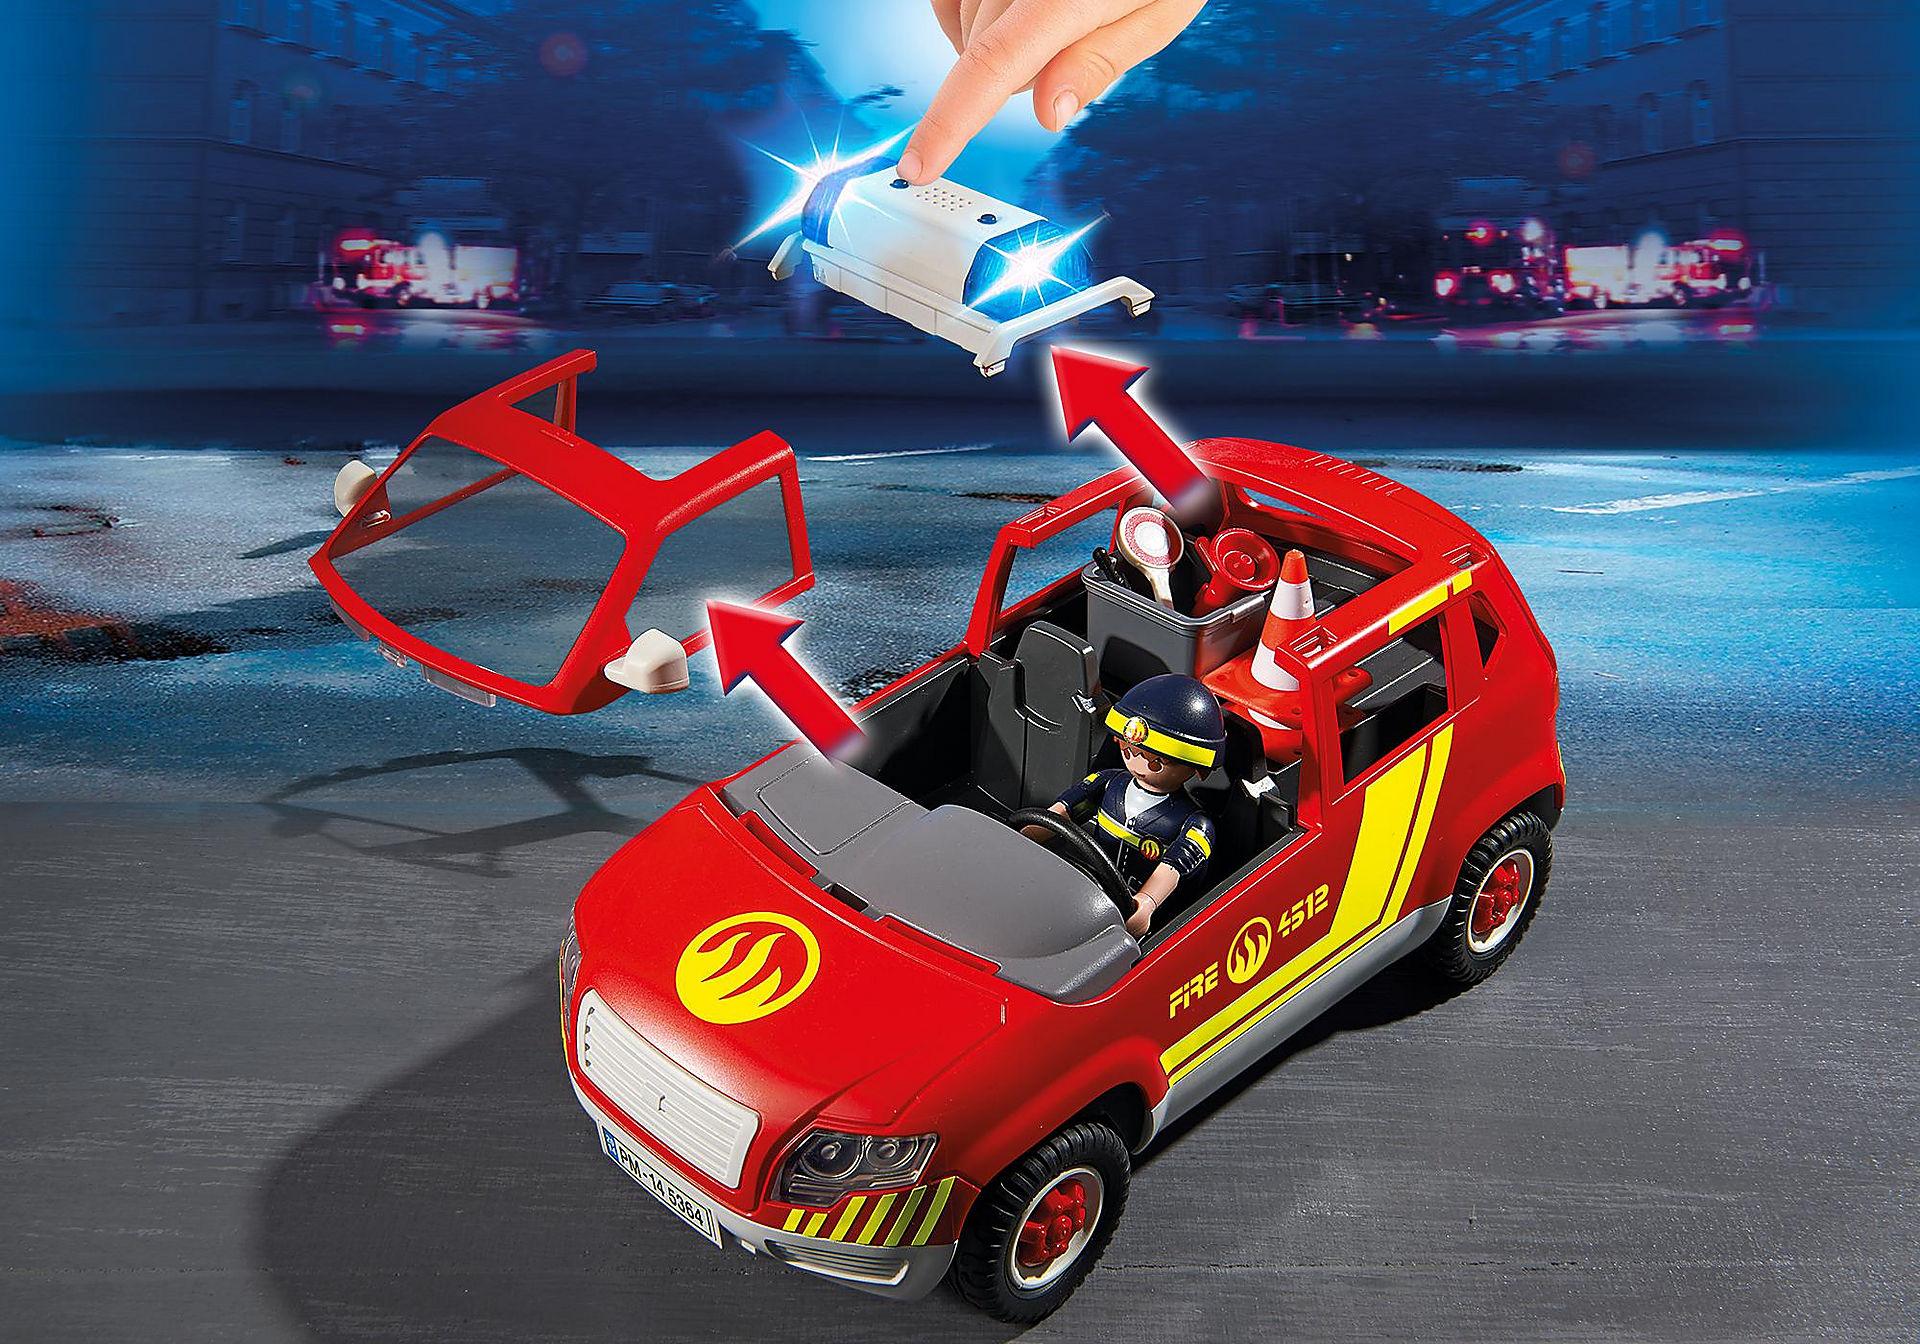 http://media.playmobil.com/i/playmobil/5364_product_extra1/Brandmeisterfahrzeug mit Licht und Sound